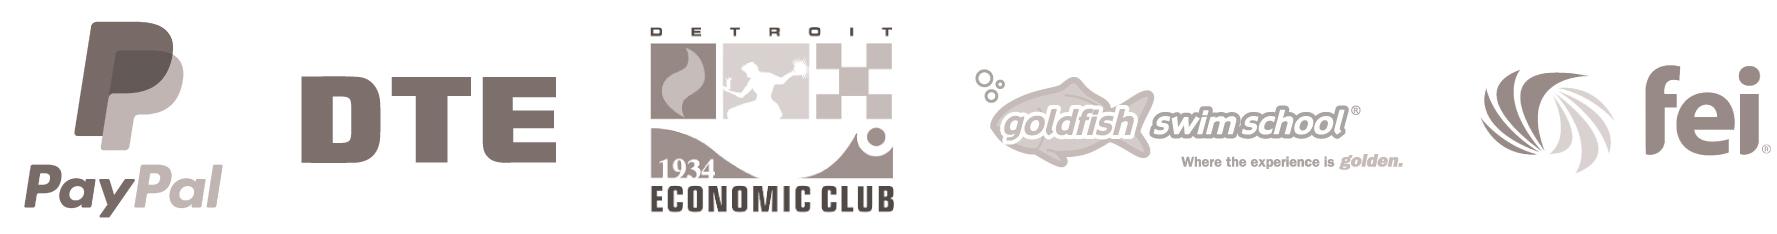 Logos: Paypal, DTE, Detroit Economic Club, Goldfish Swim School and FEI